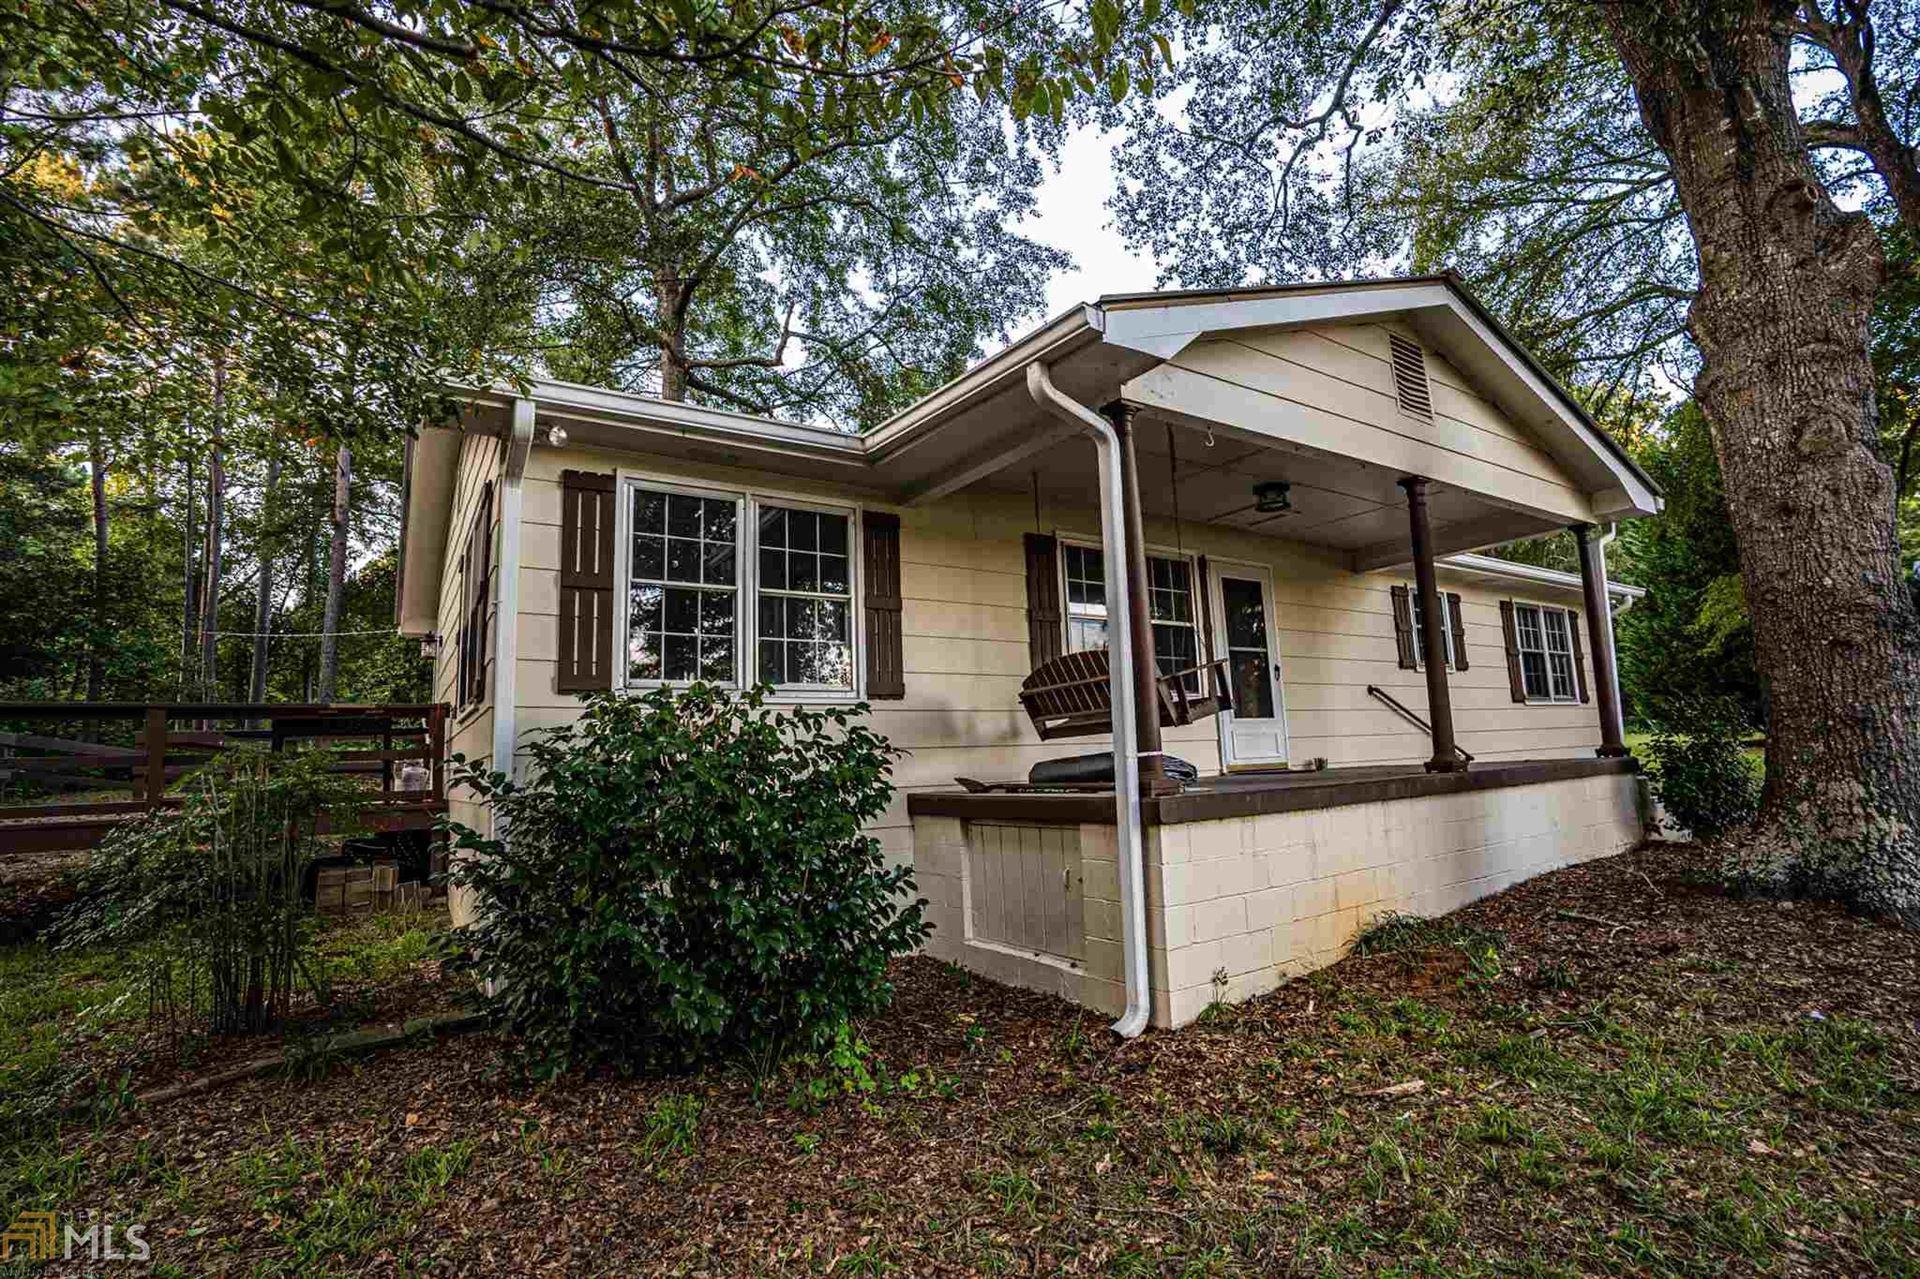 1113 Crooked Creek Rd, Eatonton, GA 31024 - MLS#: 8863875